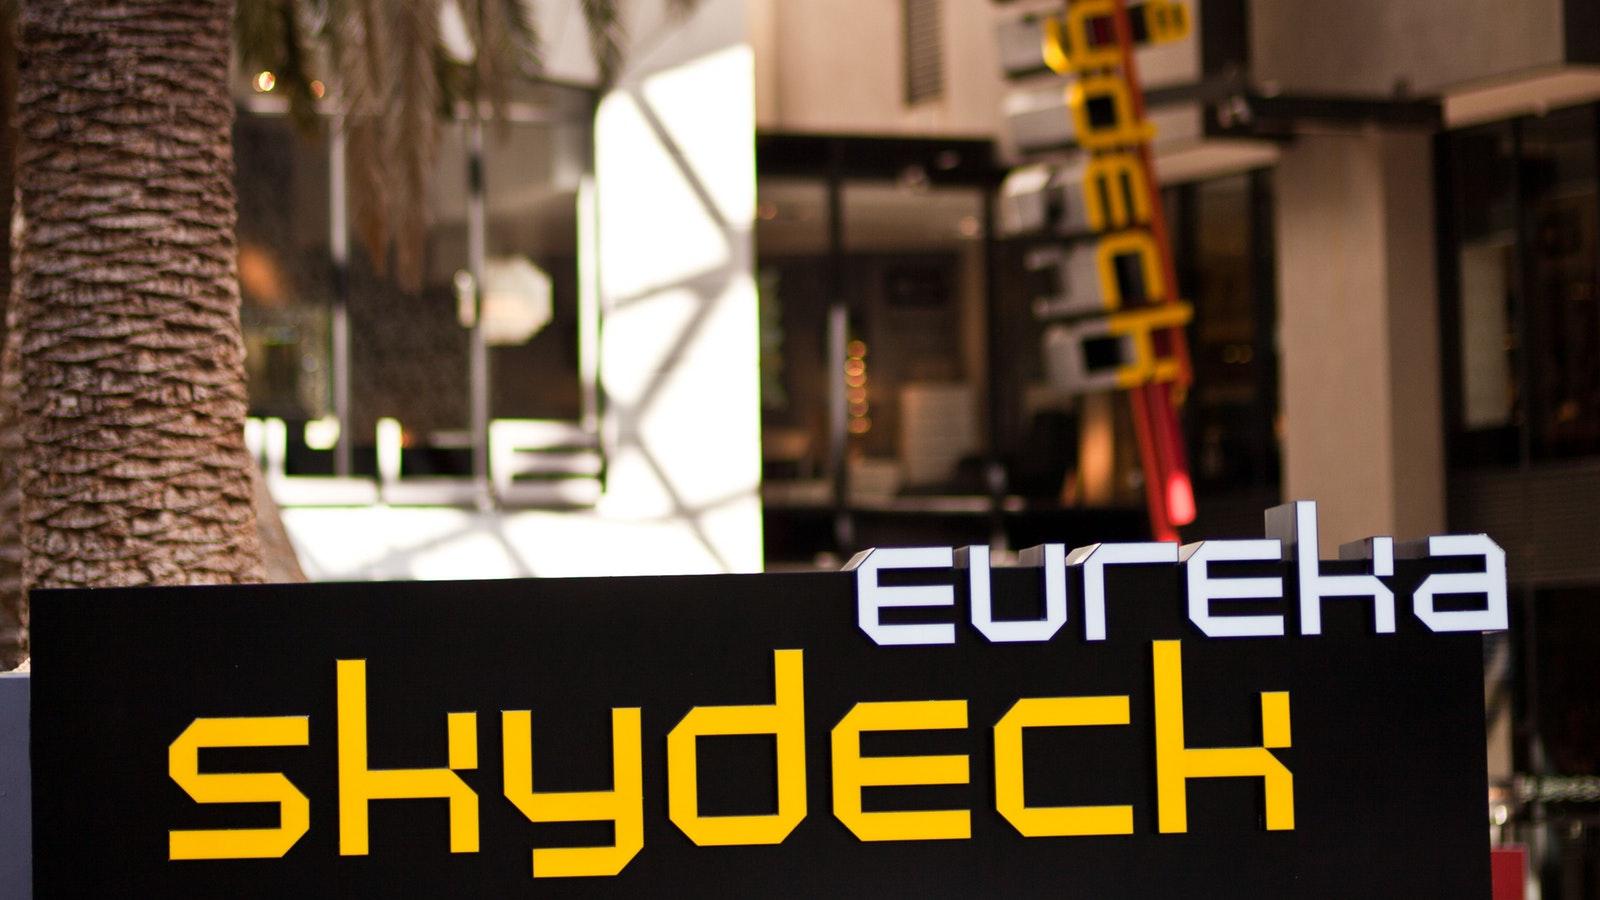 Eureka Skydeck Main Entrance